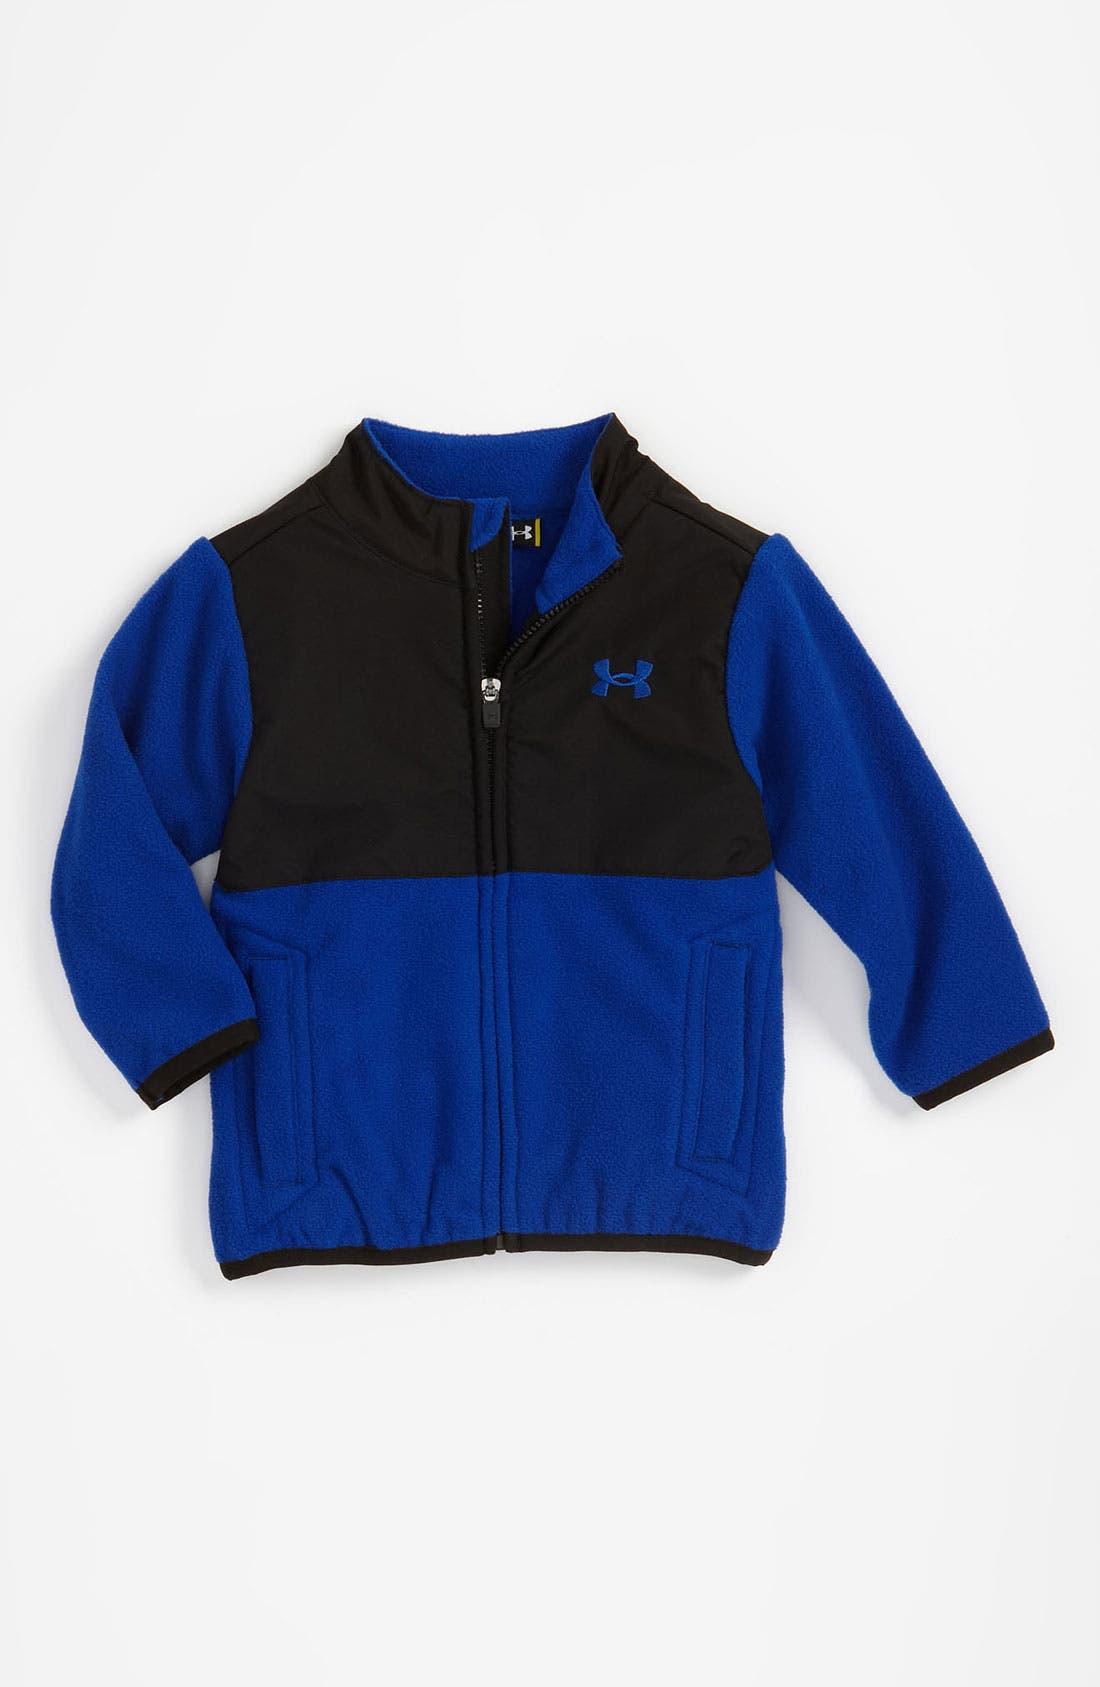 Main Image - Under Armour Fleece Jacket (Toddler)